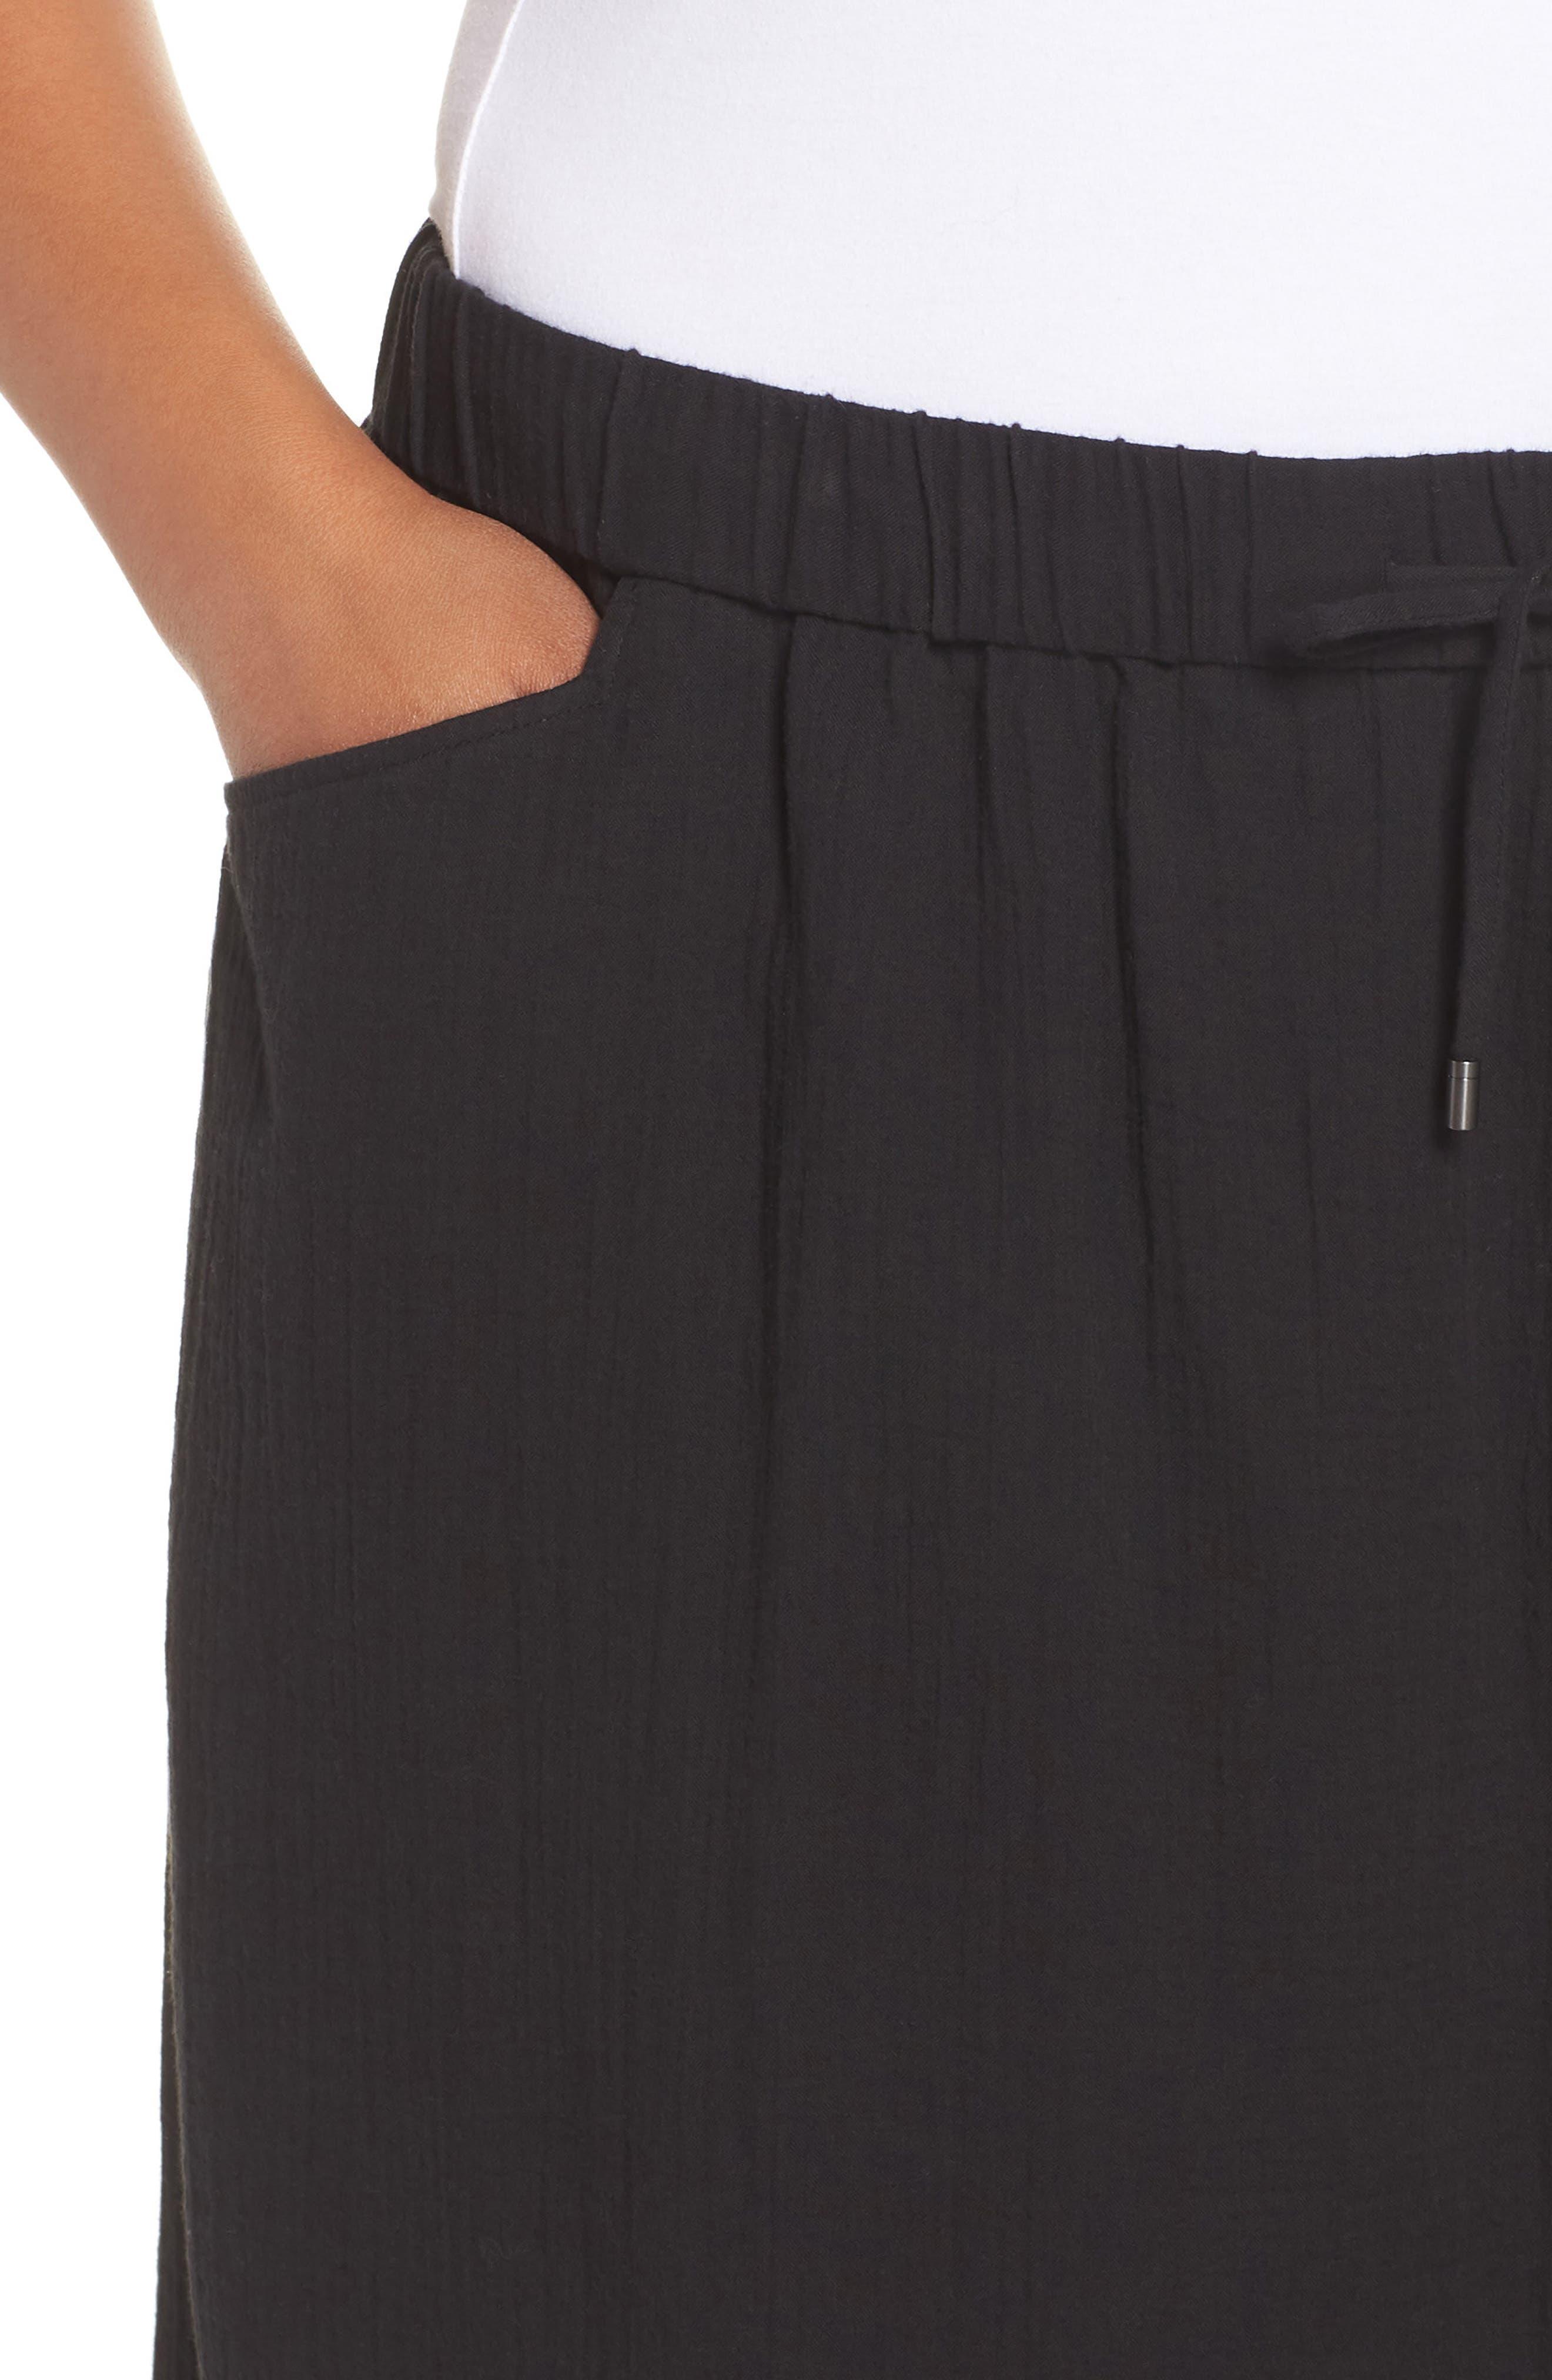 Drawstring Maxi Skirt,                             Alternate thumbnail 4, color,                             001